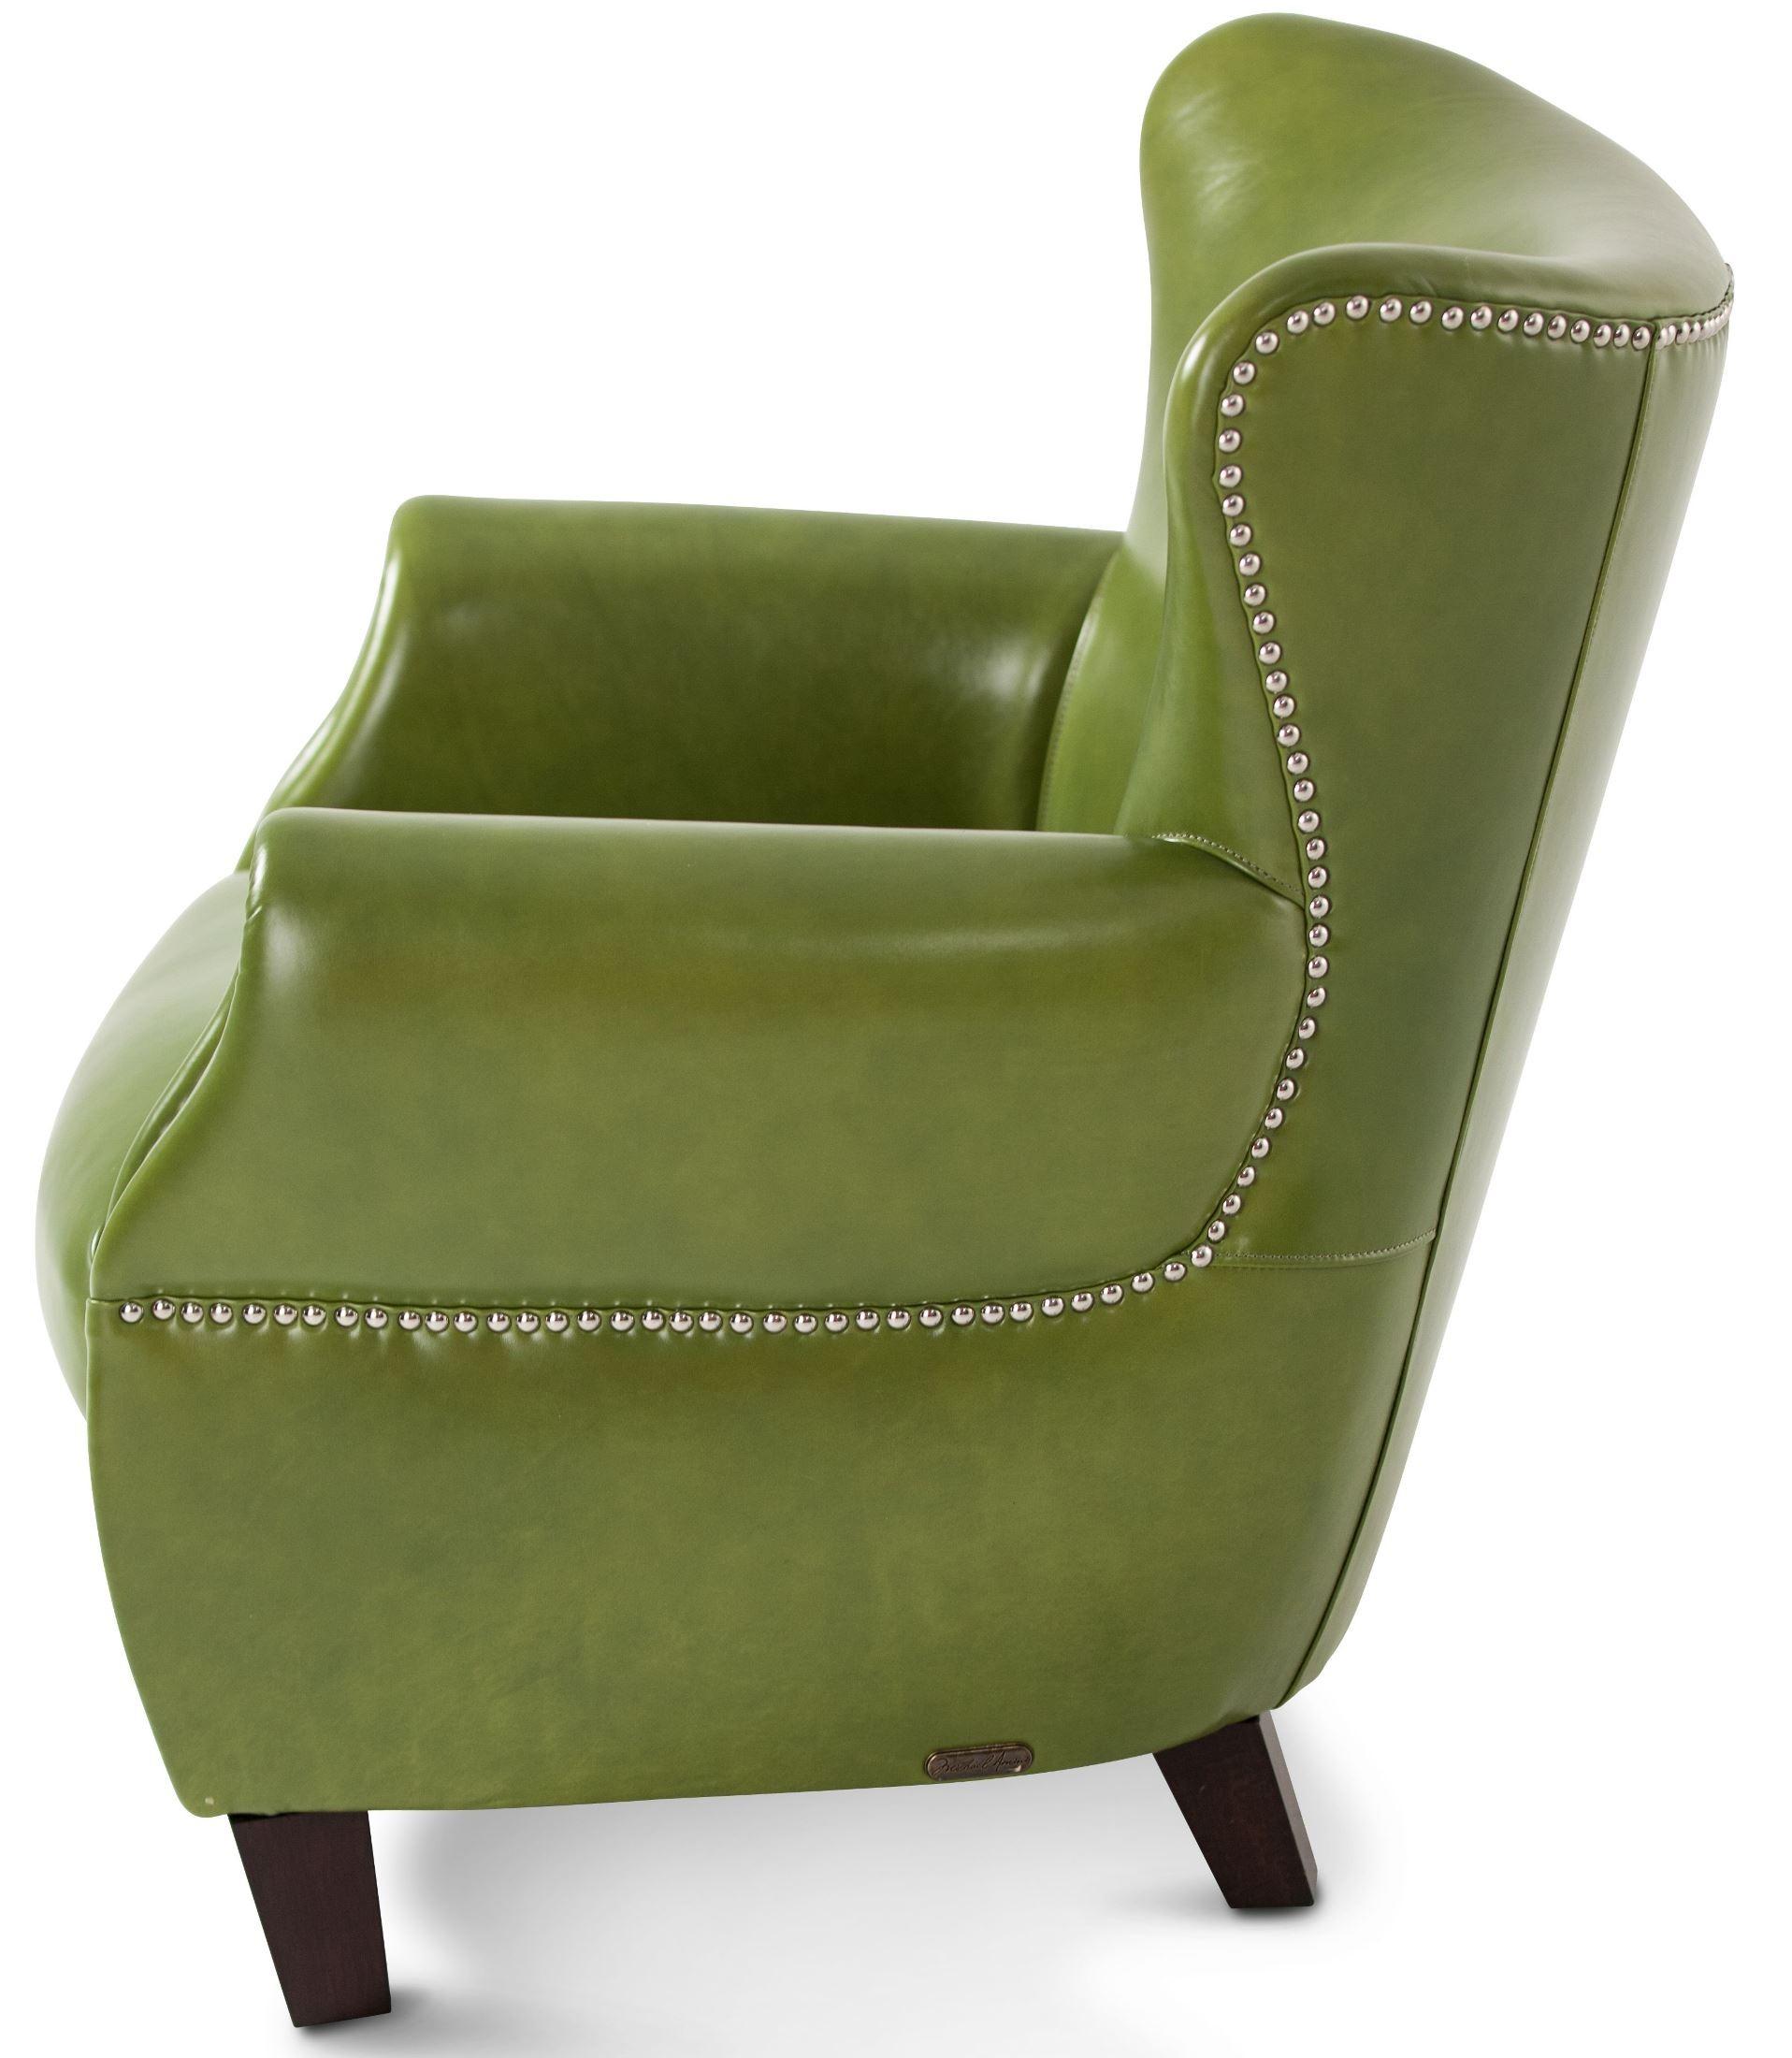 Pistachio Green Leather Sofa